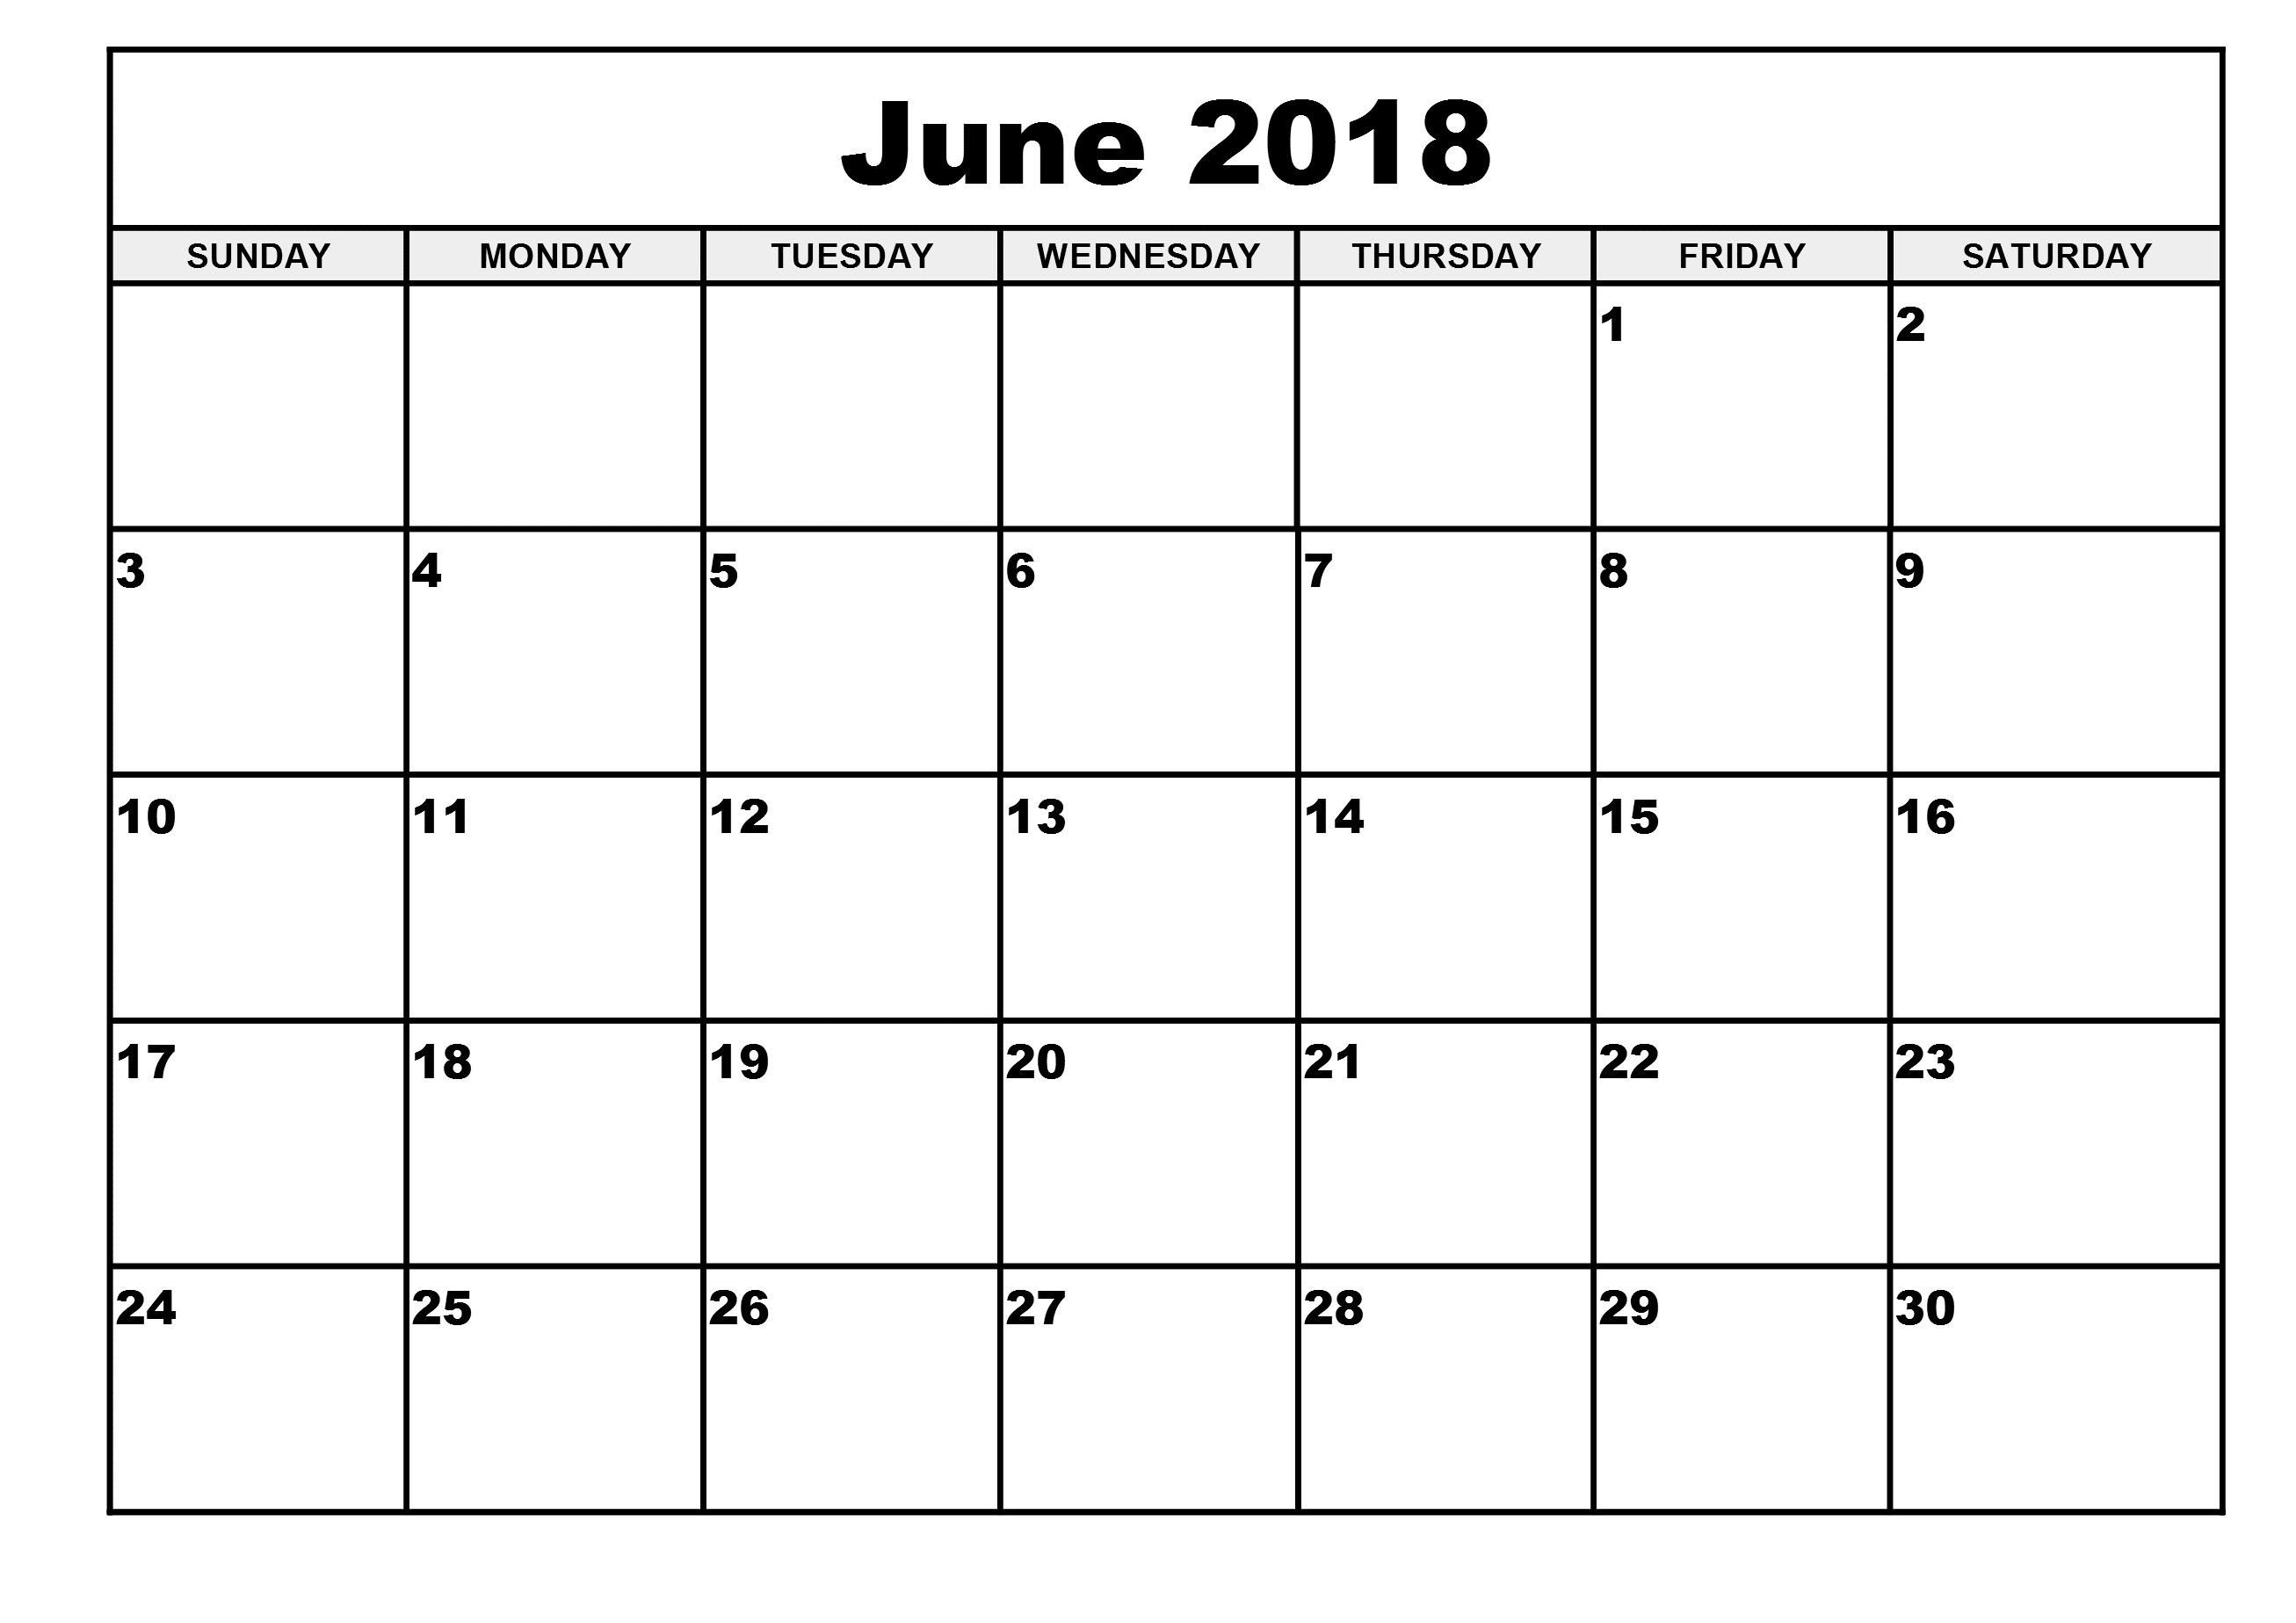 Http Zhonggdjw Com 2018 June Calendar Html 2018 June Calendar Printable Tem Monthly Calendar Template Blank Monthly Calendar Template Calendar 2019 Printable